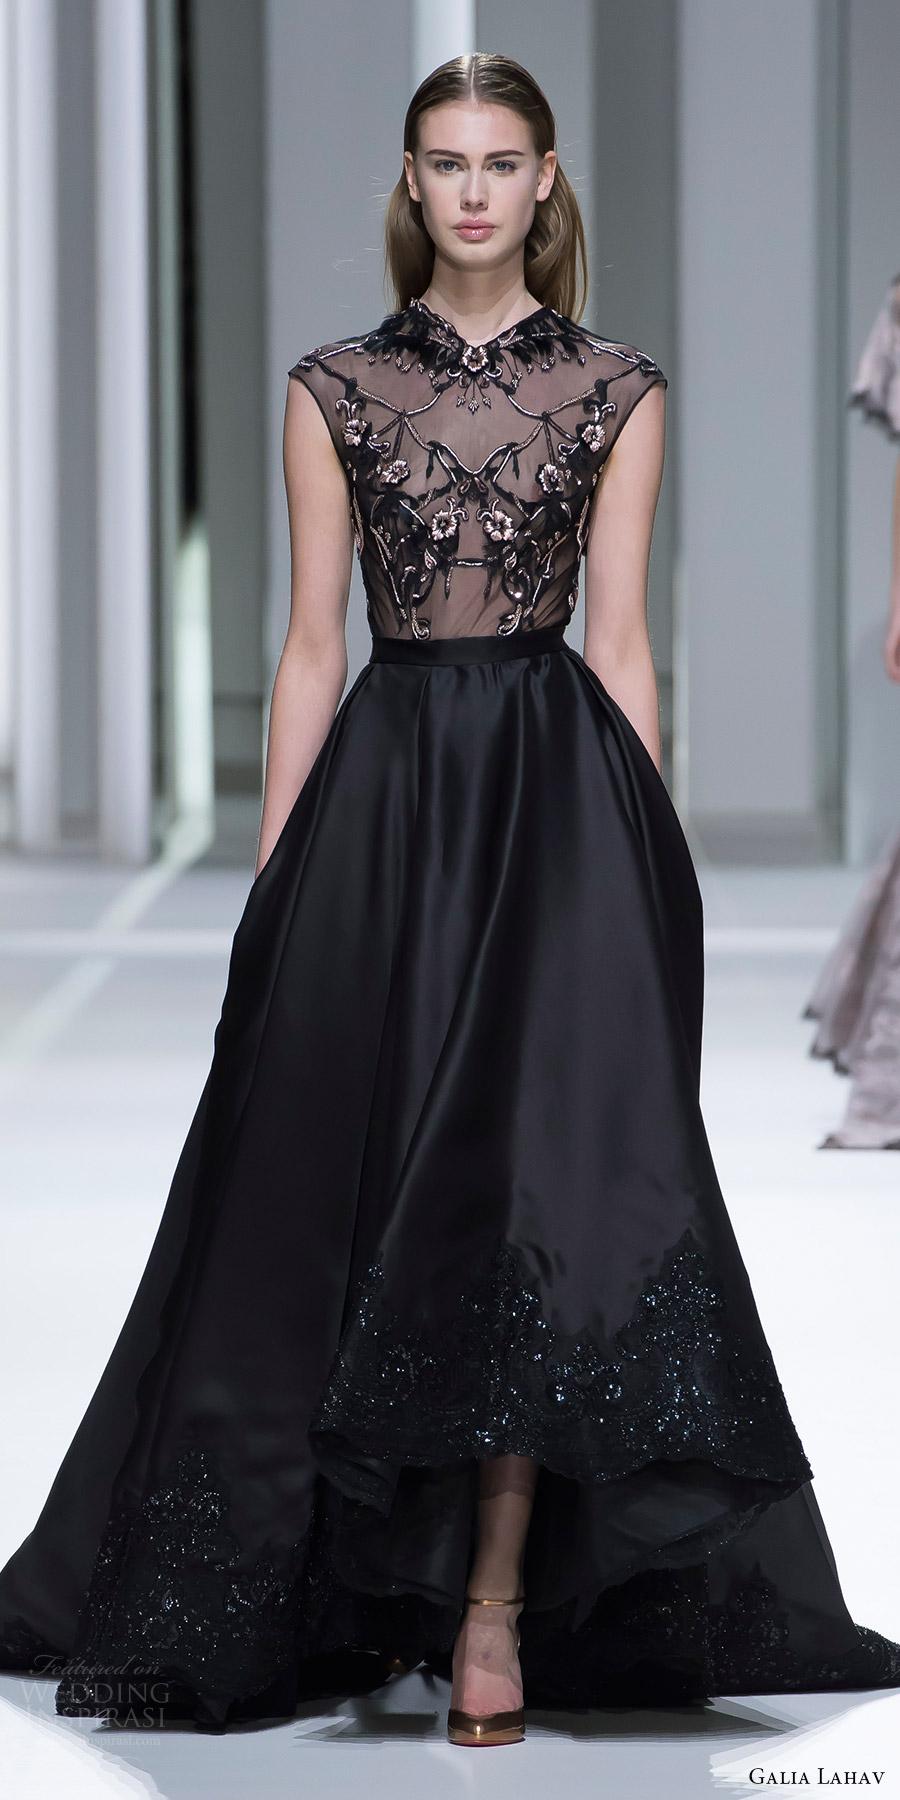 galia lahav haute couture spring 2017 (rubie ran) gown